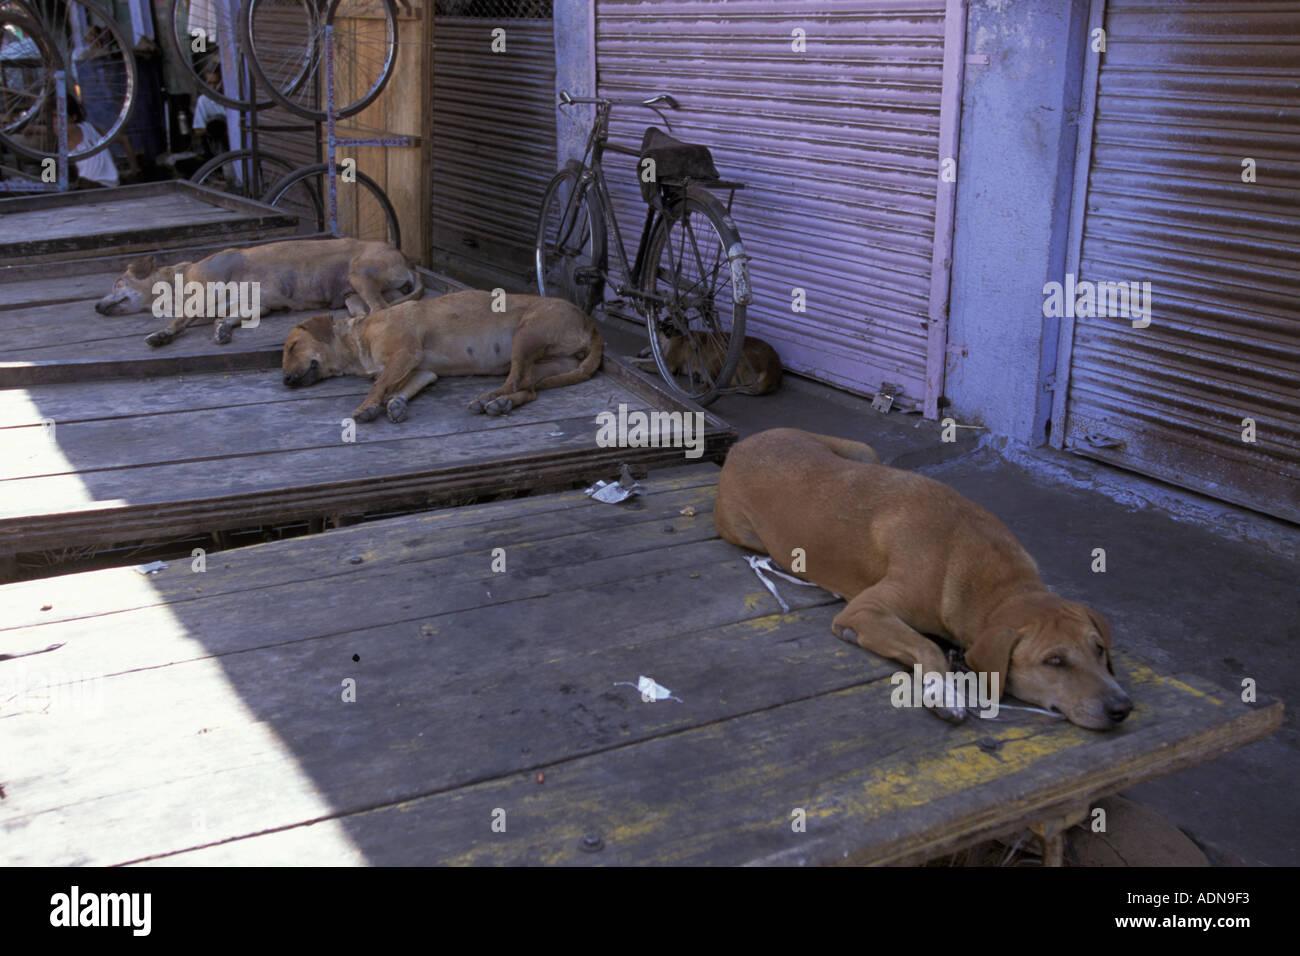 India Jodhpur 3 sleeping dogs in mid day heat - Stock Image